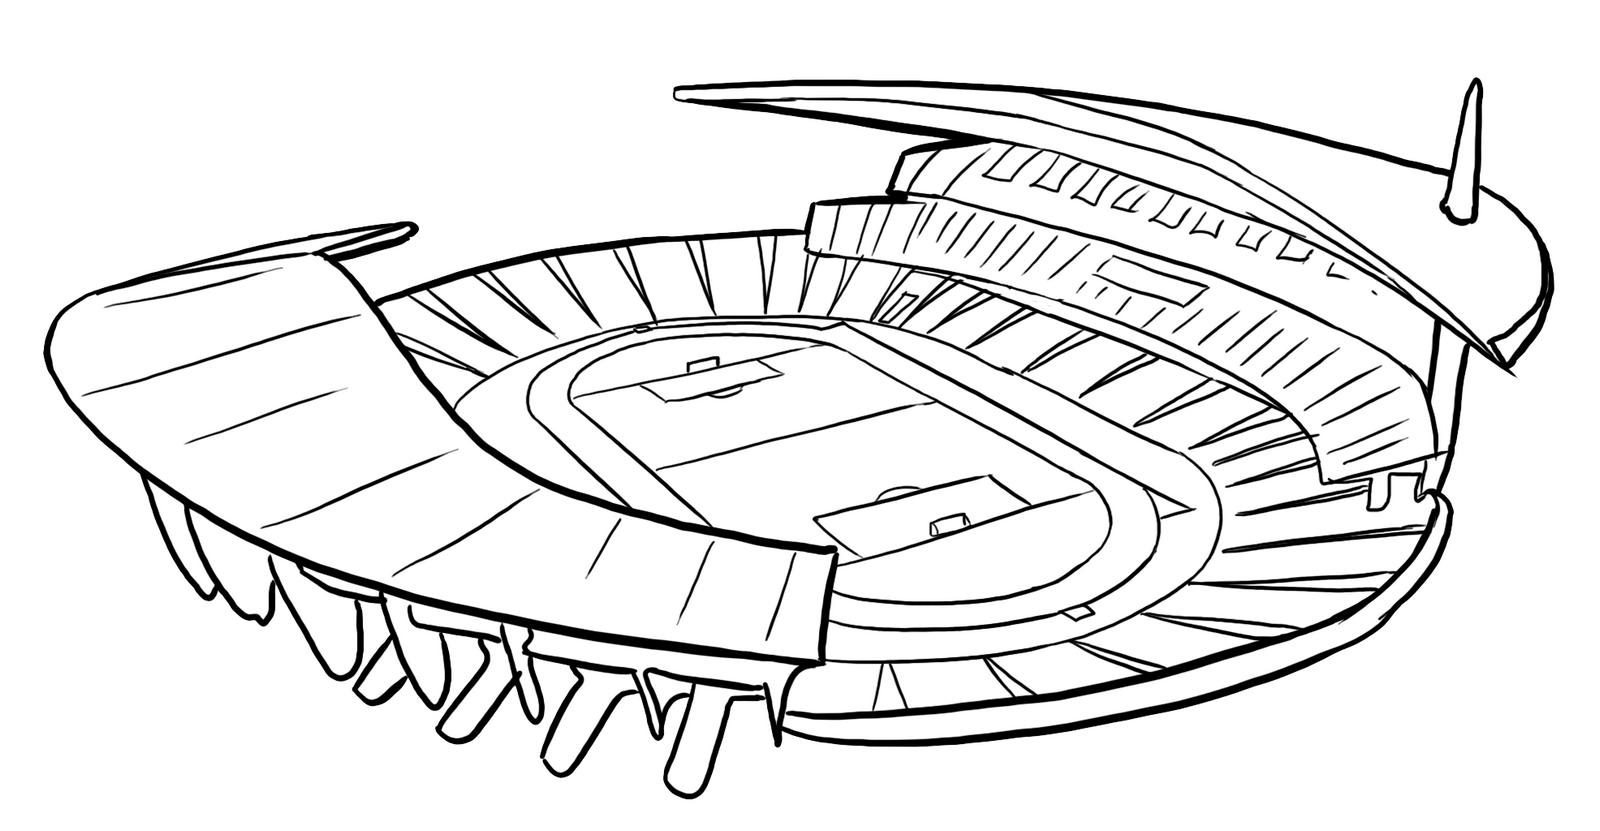 international stadium coloring page